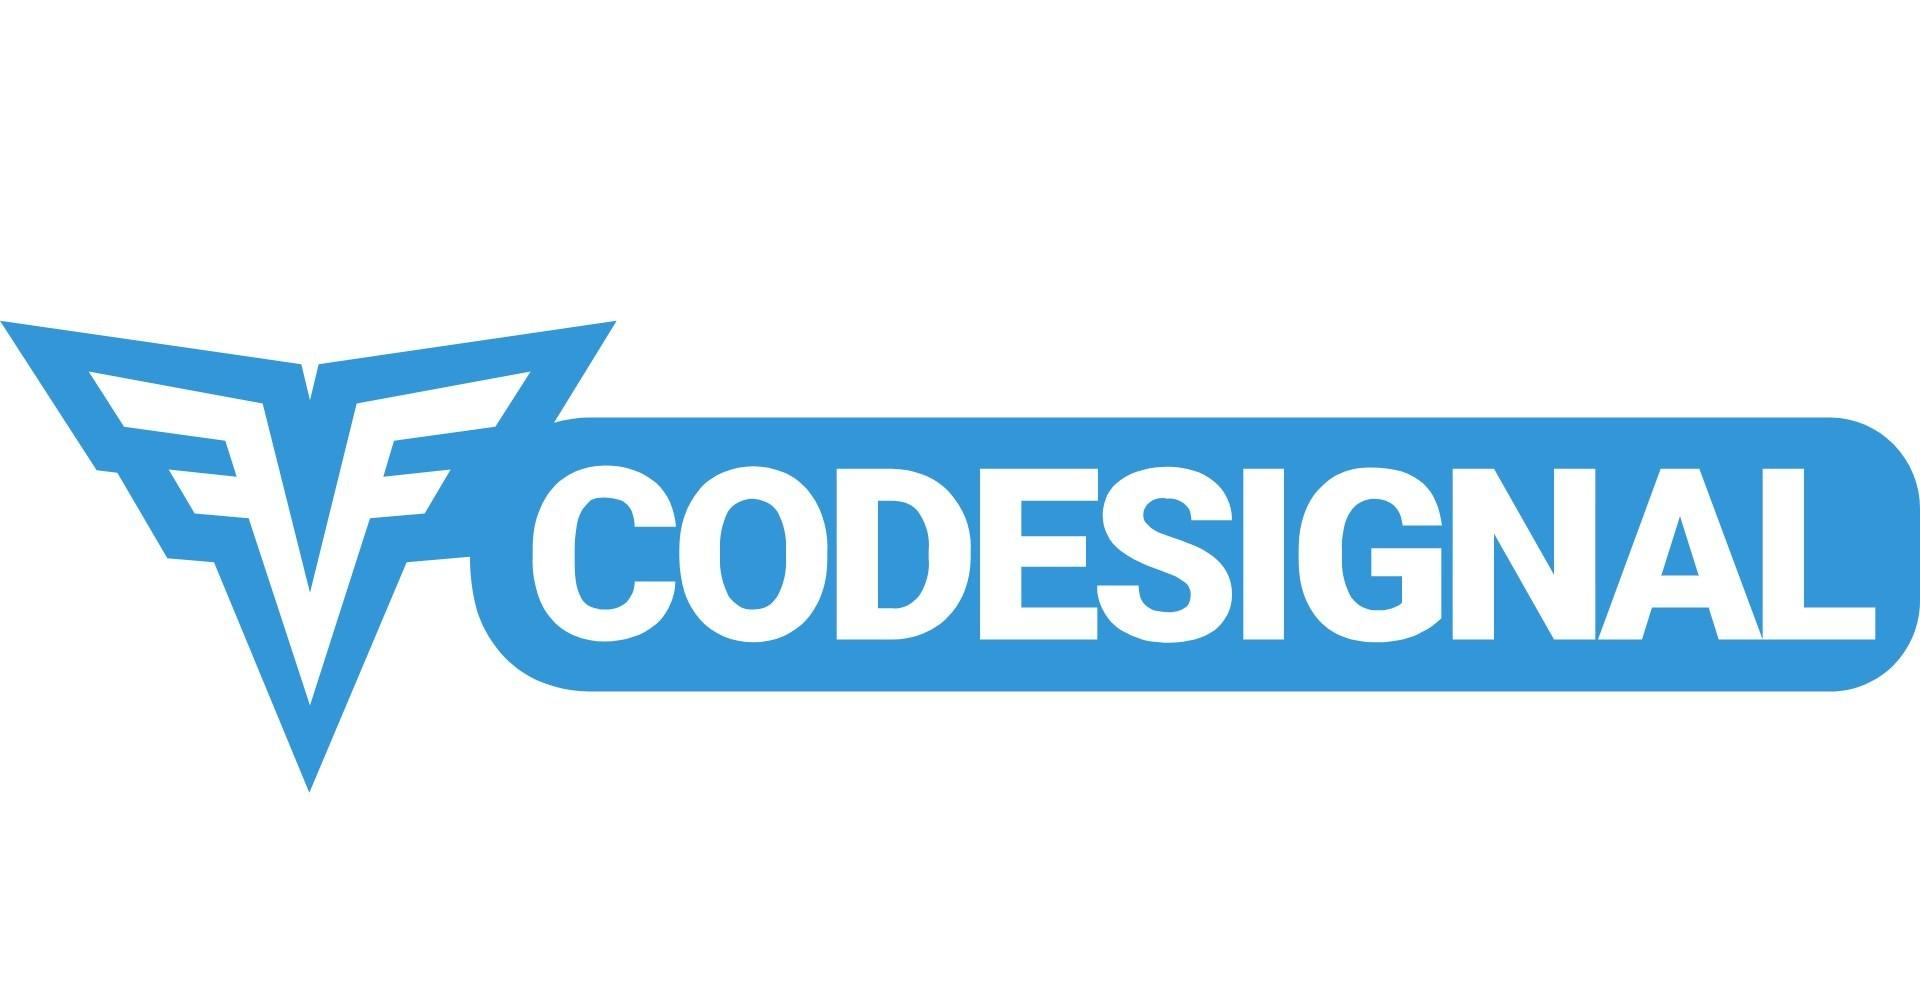 CodeSignal company logo